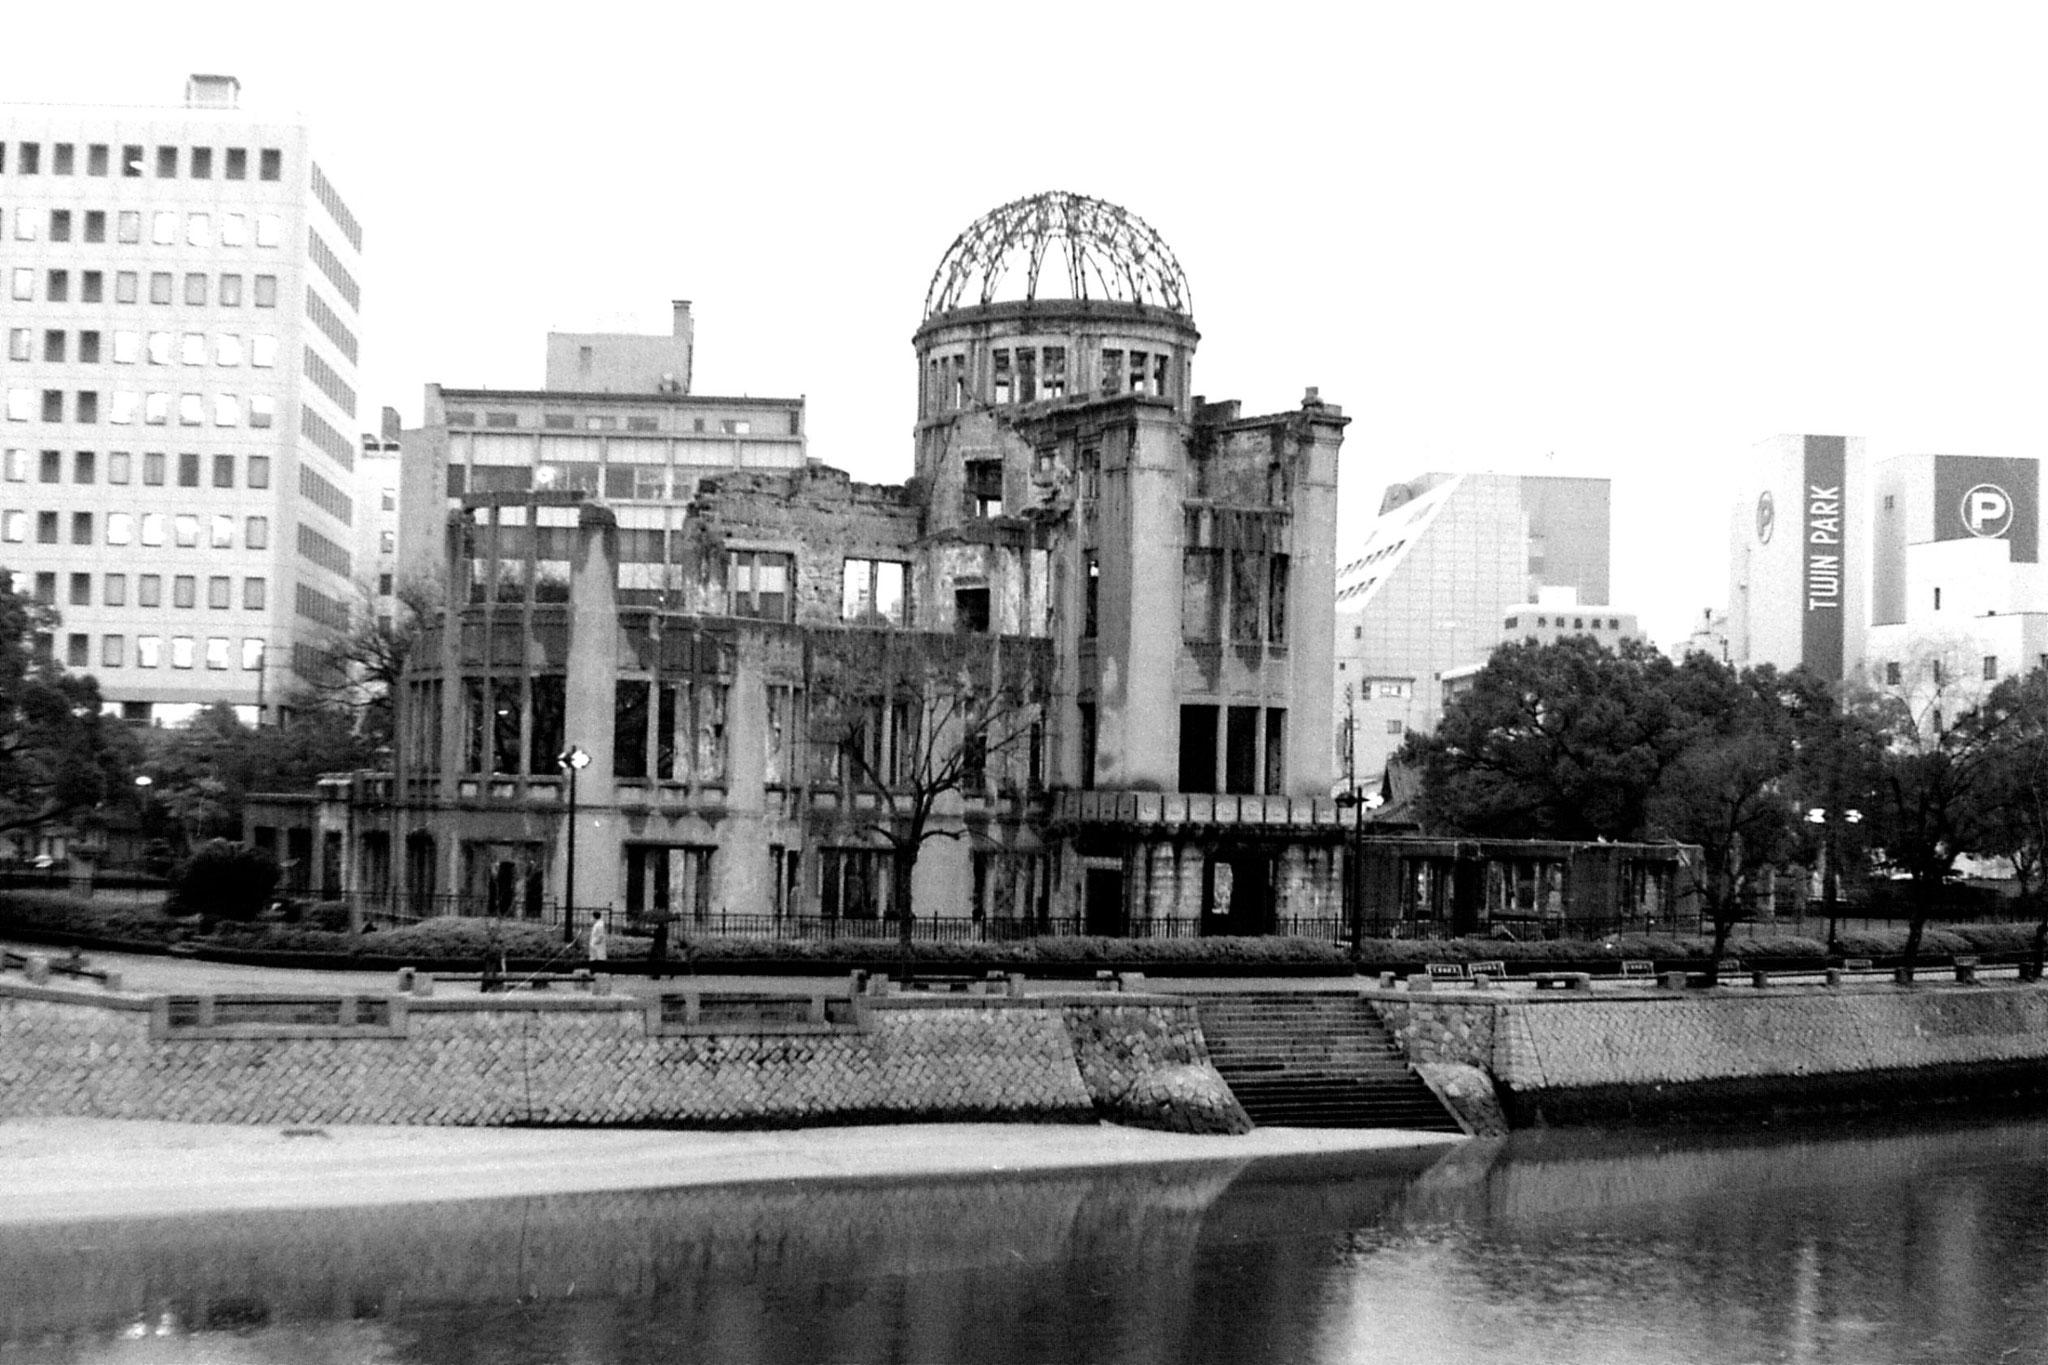 18/1/1989: 17: Hiroshima dome